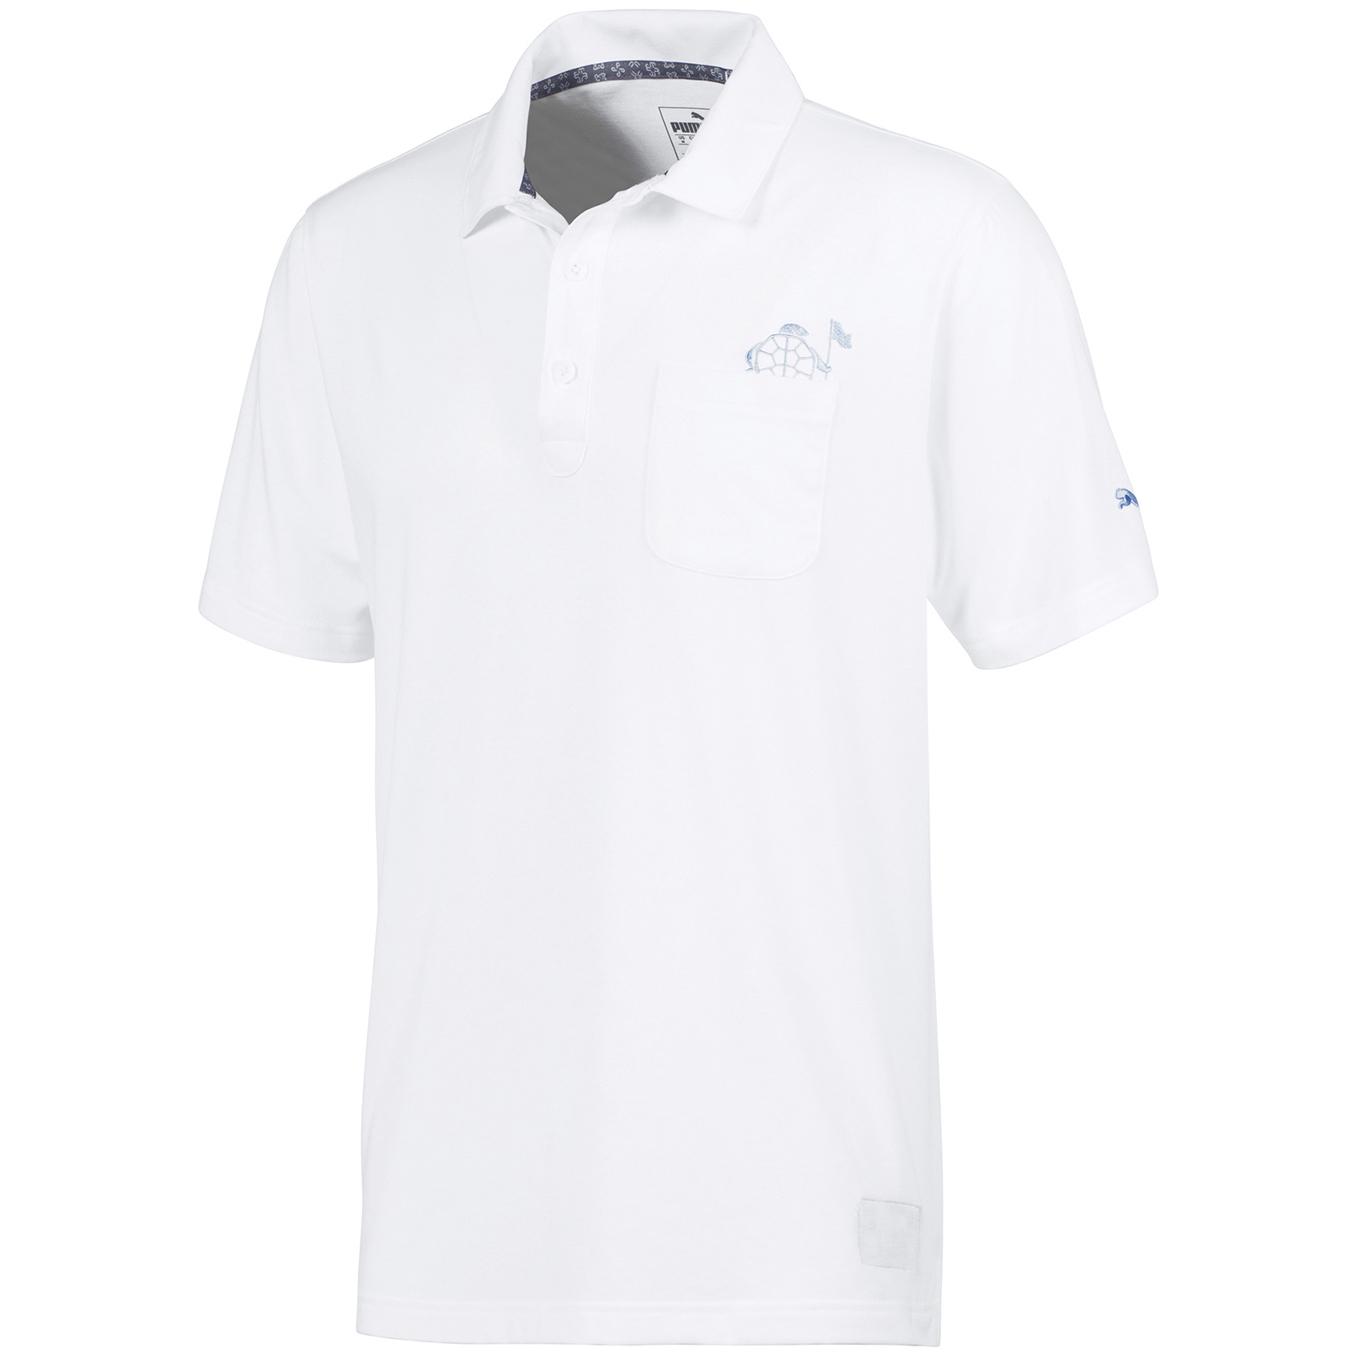 Puma Golf Slow Play Pocket Polo - Limited Edition